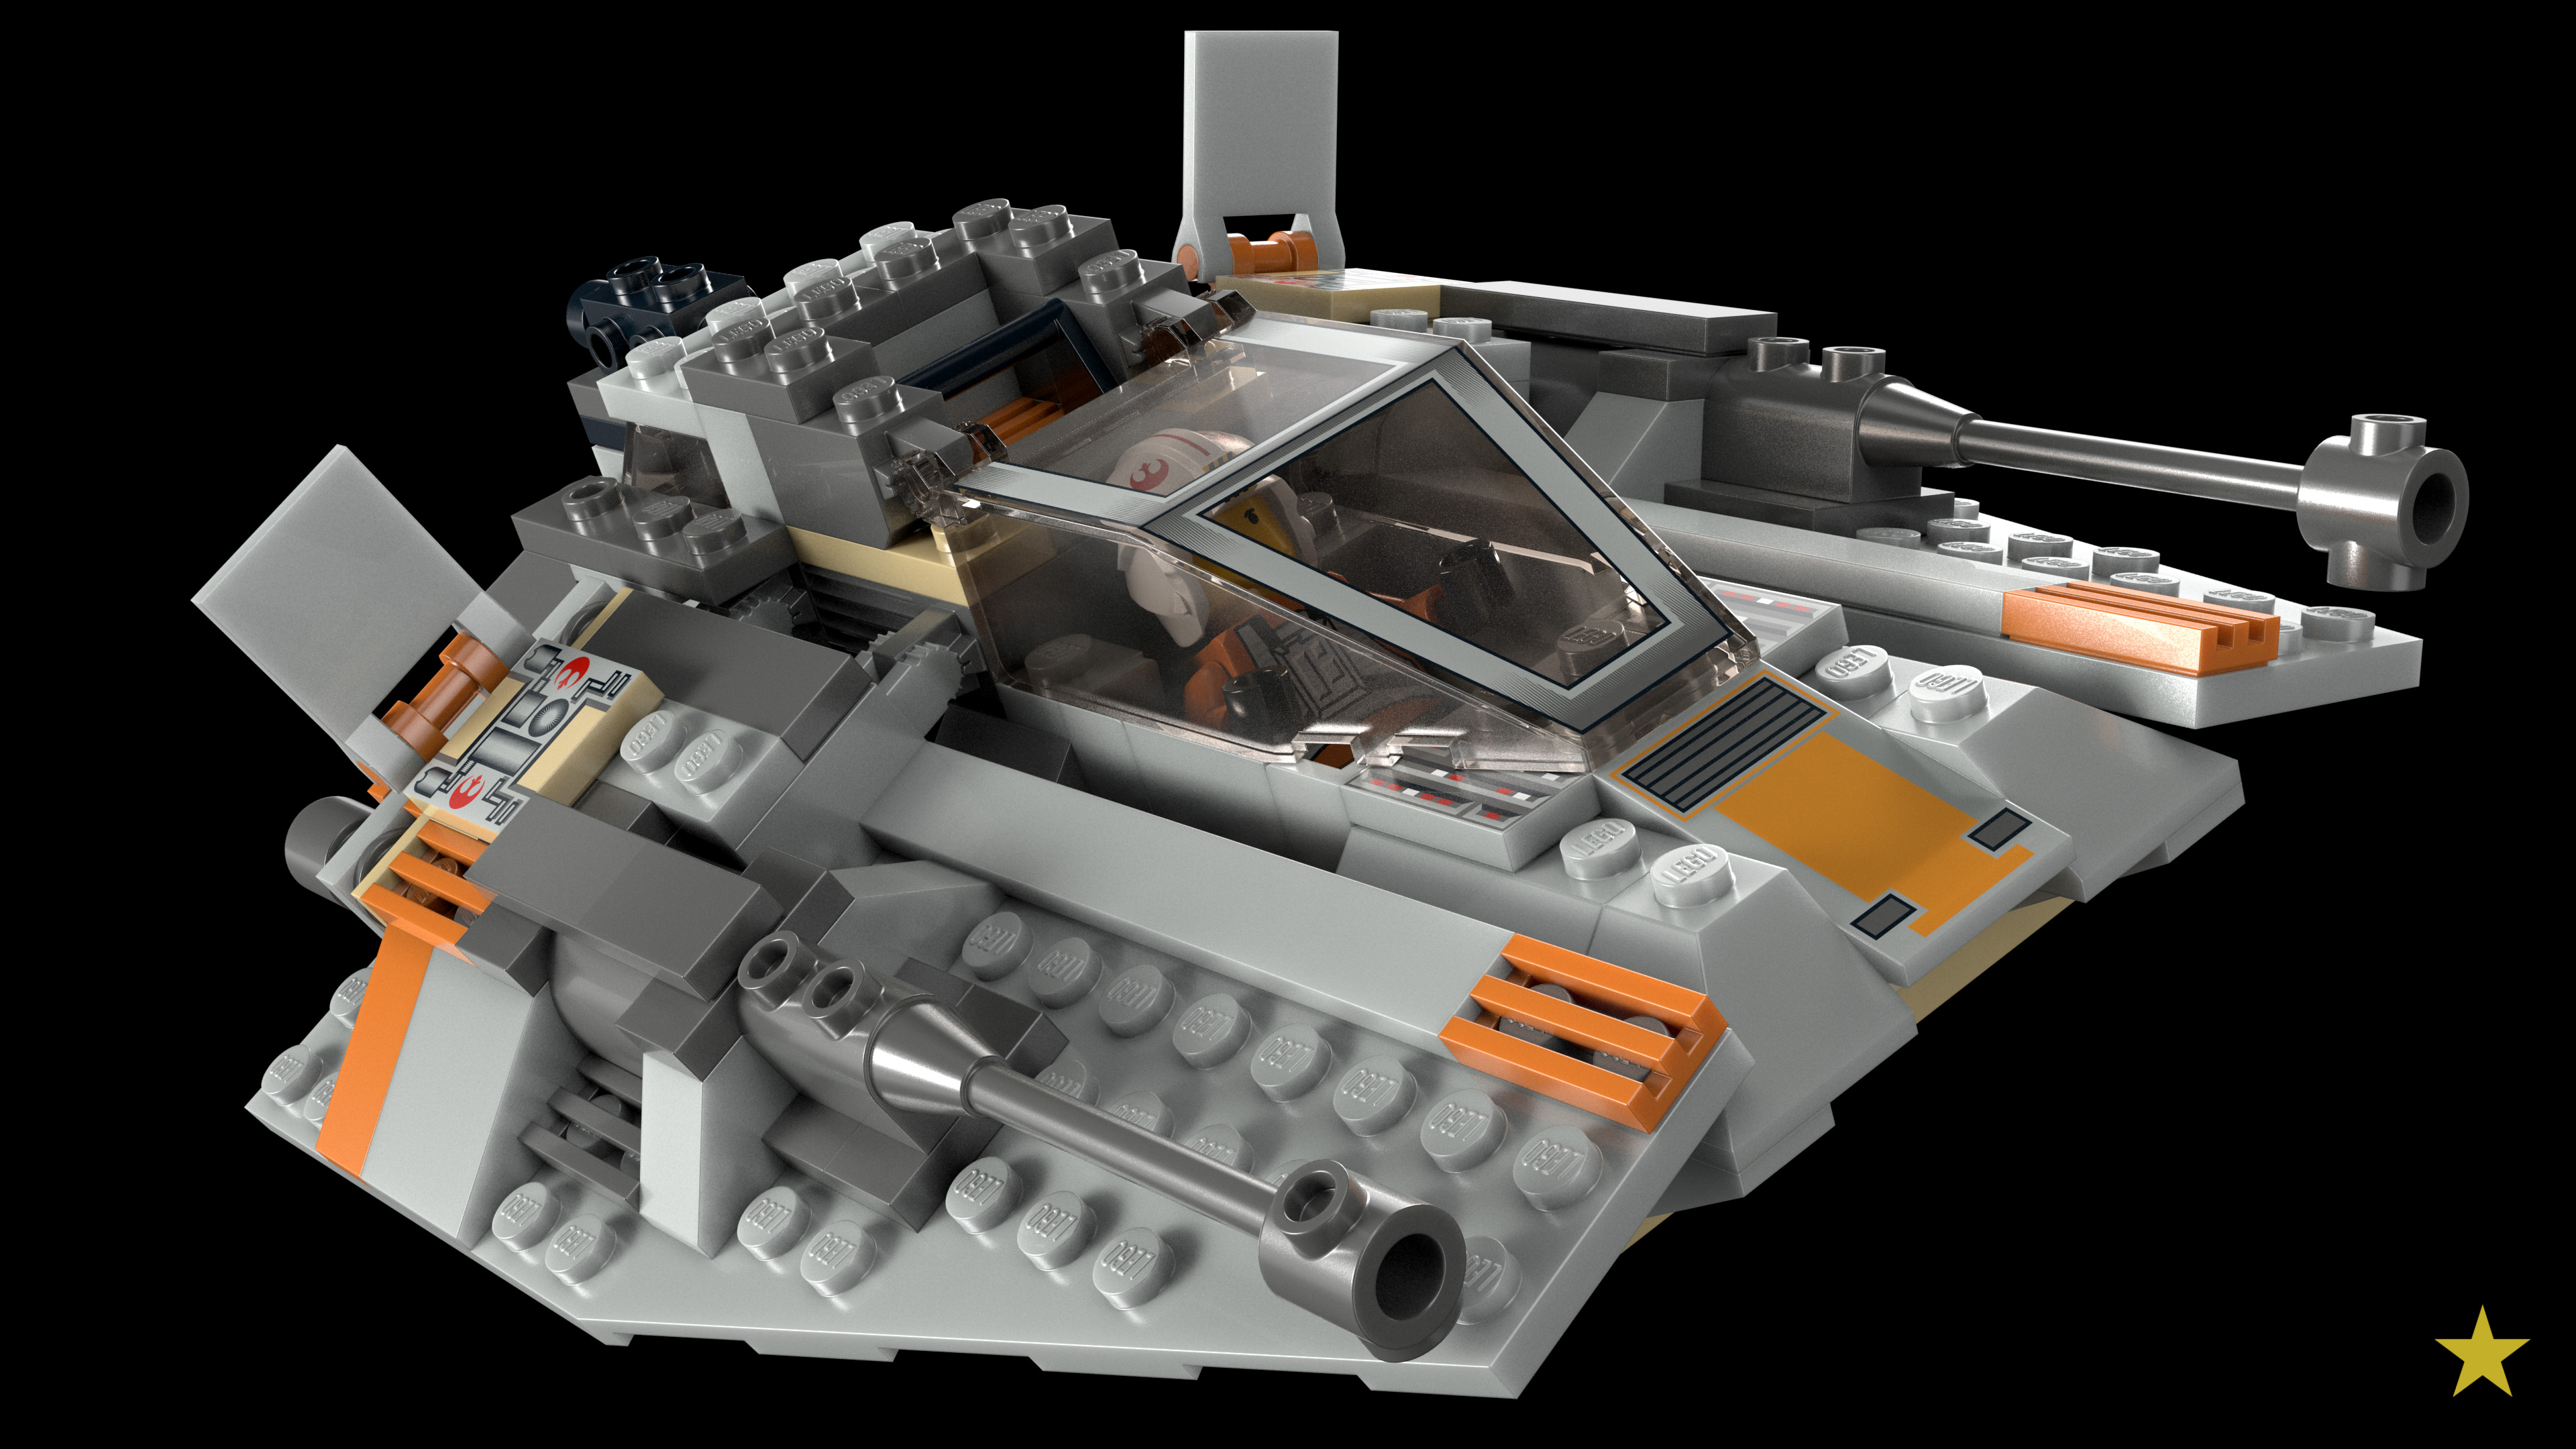 [Image: 7130_Snowspeeder_Normal_Studs_v03c_LEGO_RGB_Wide_4K.jpg]